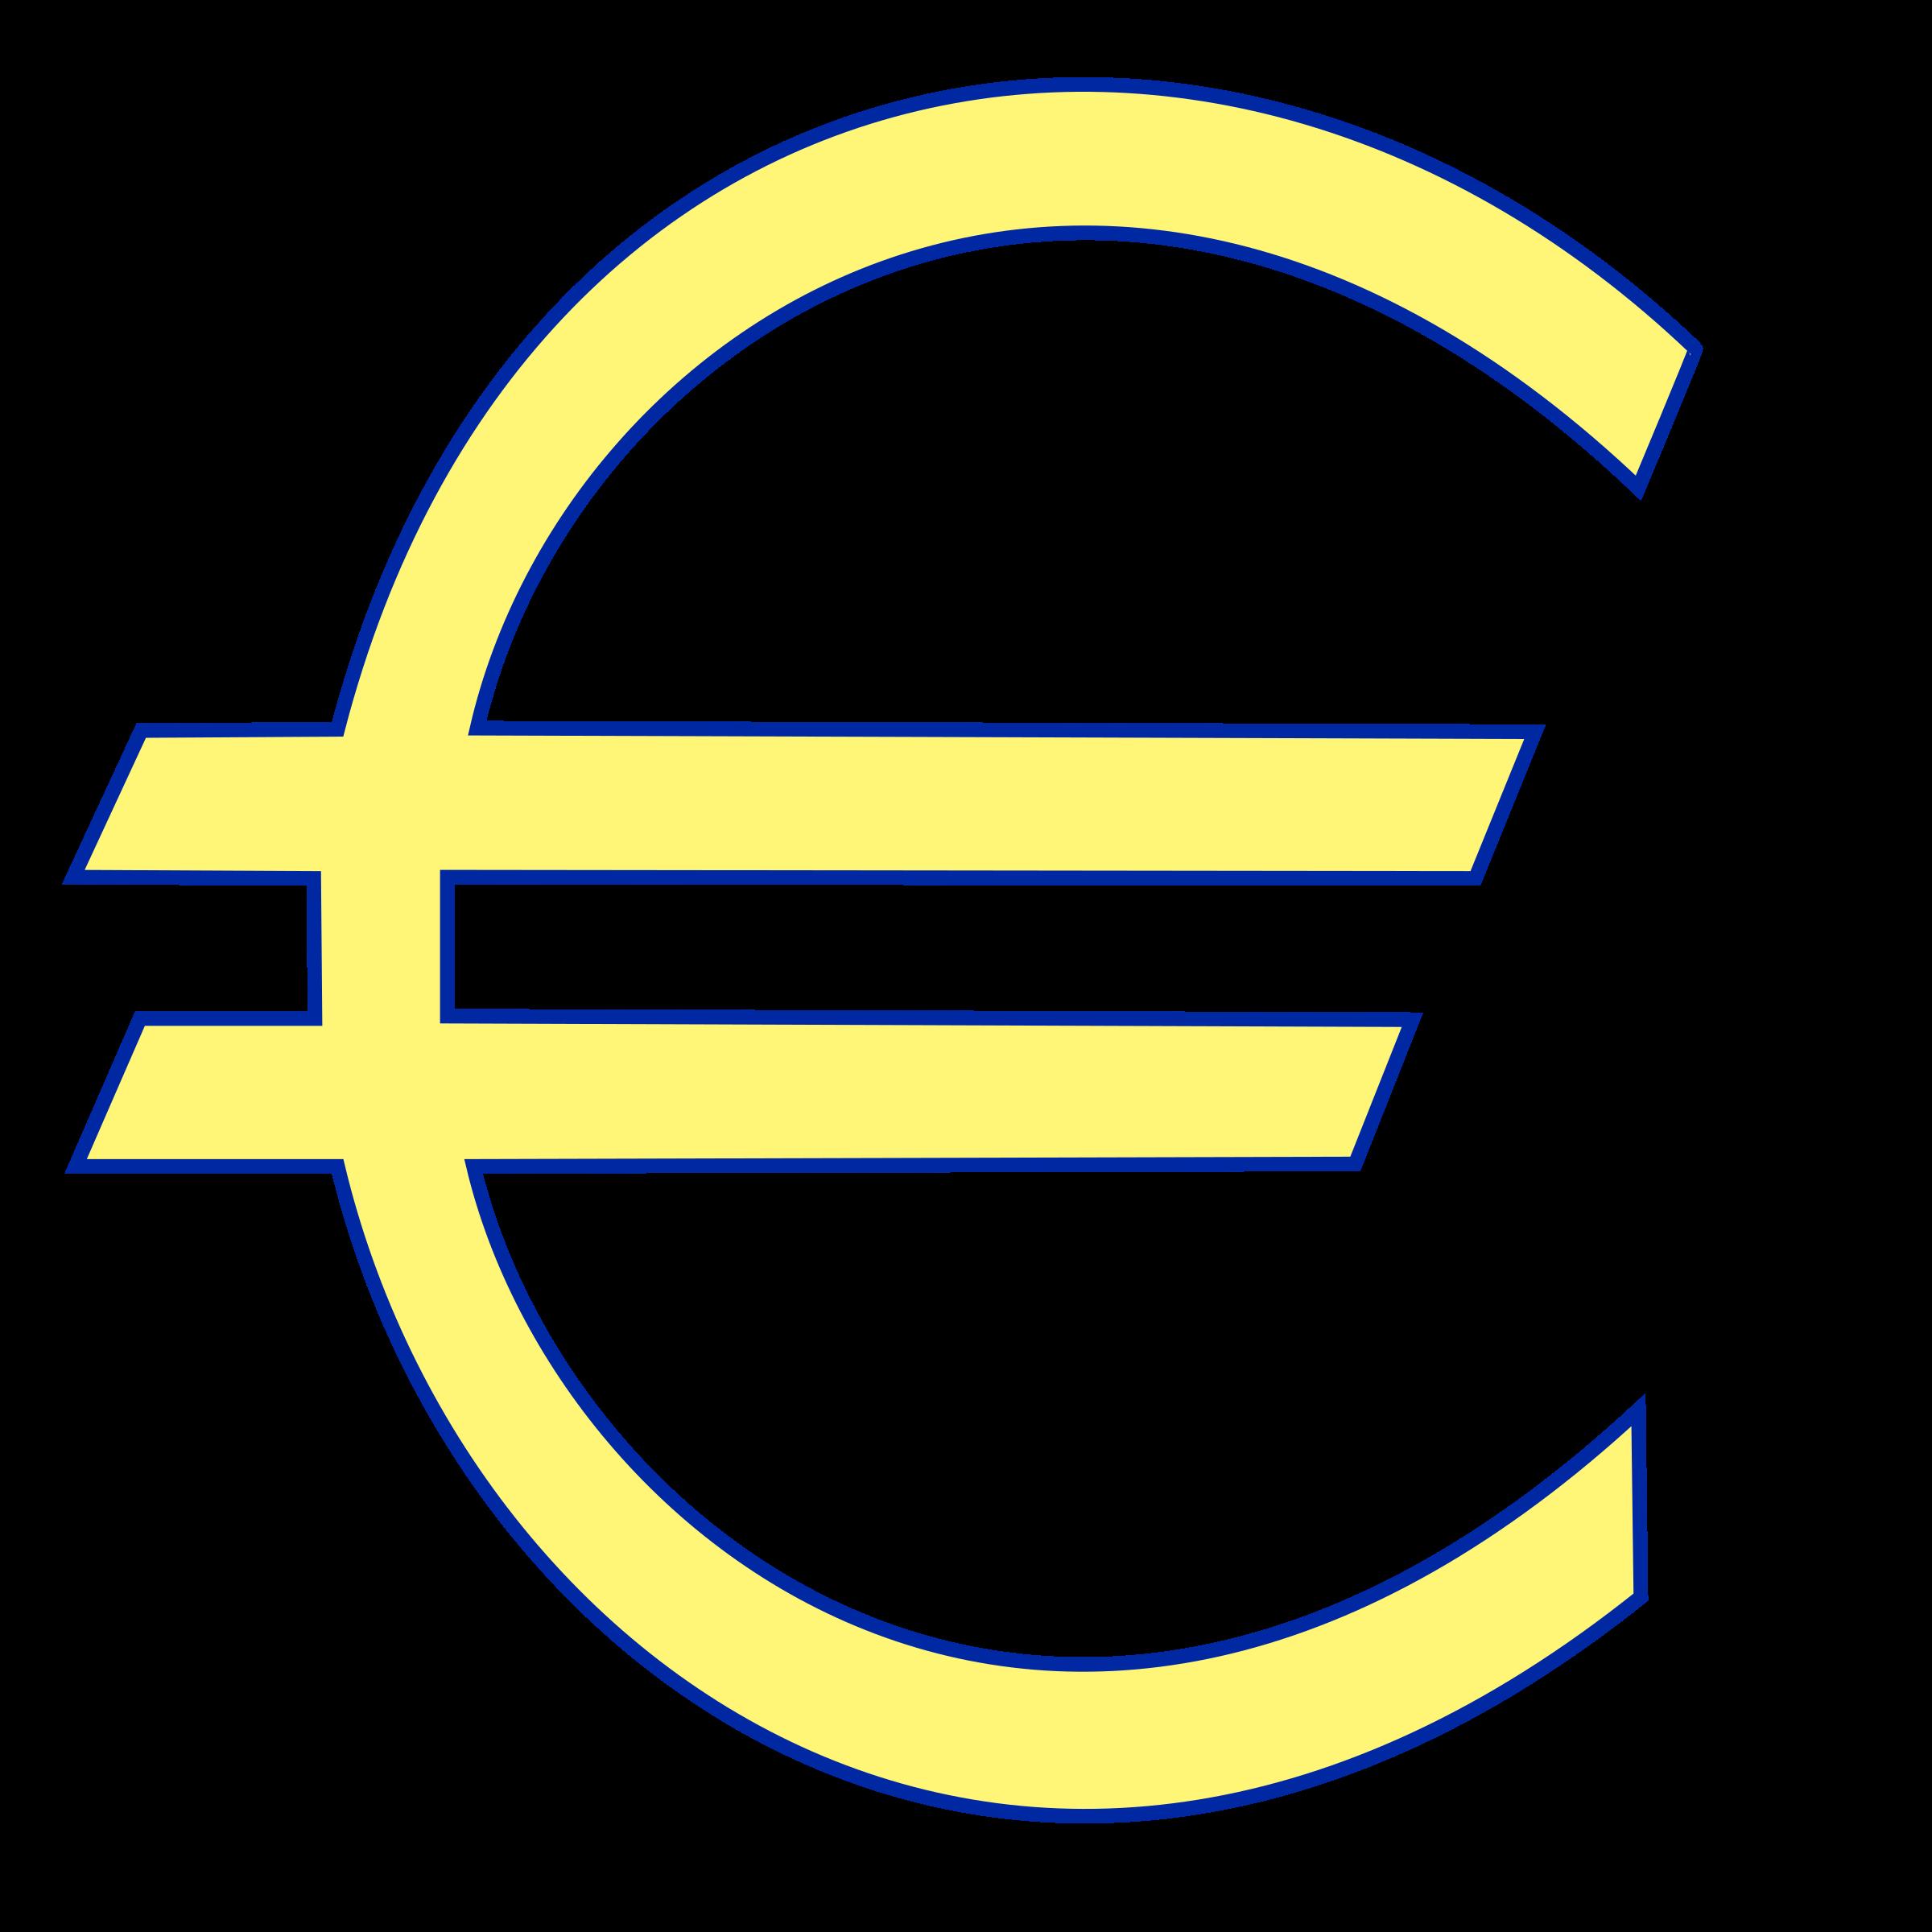 Euro symbol big image. Clipart circle money